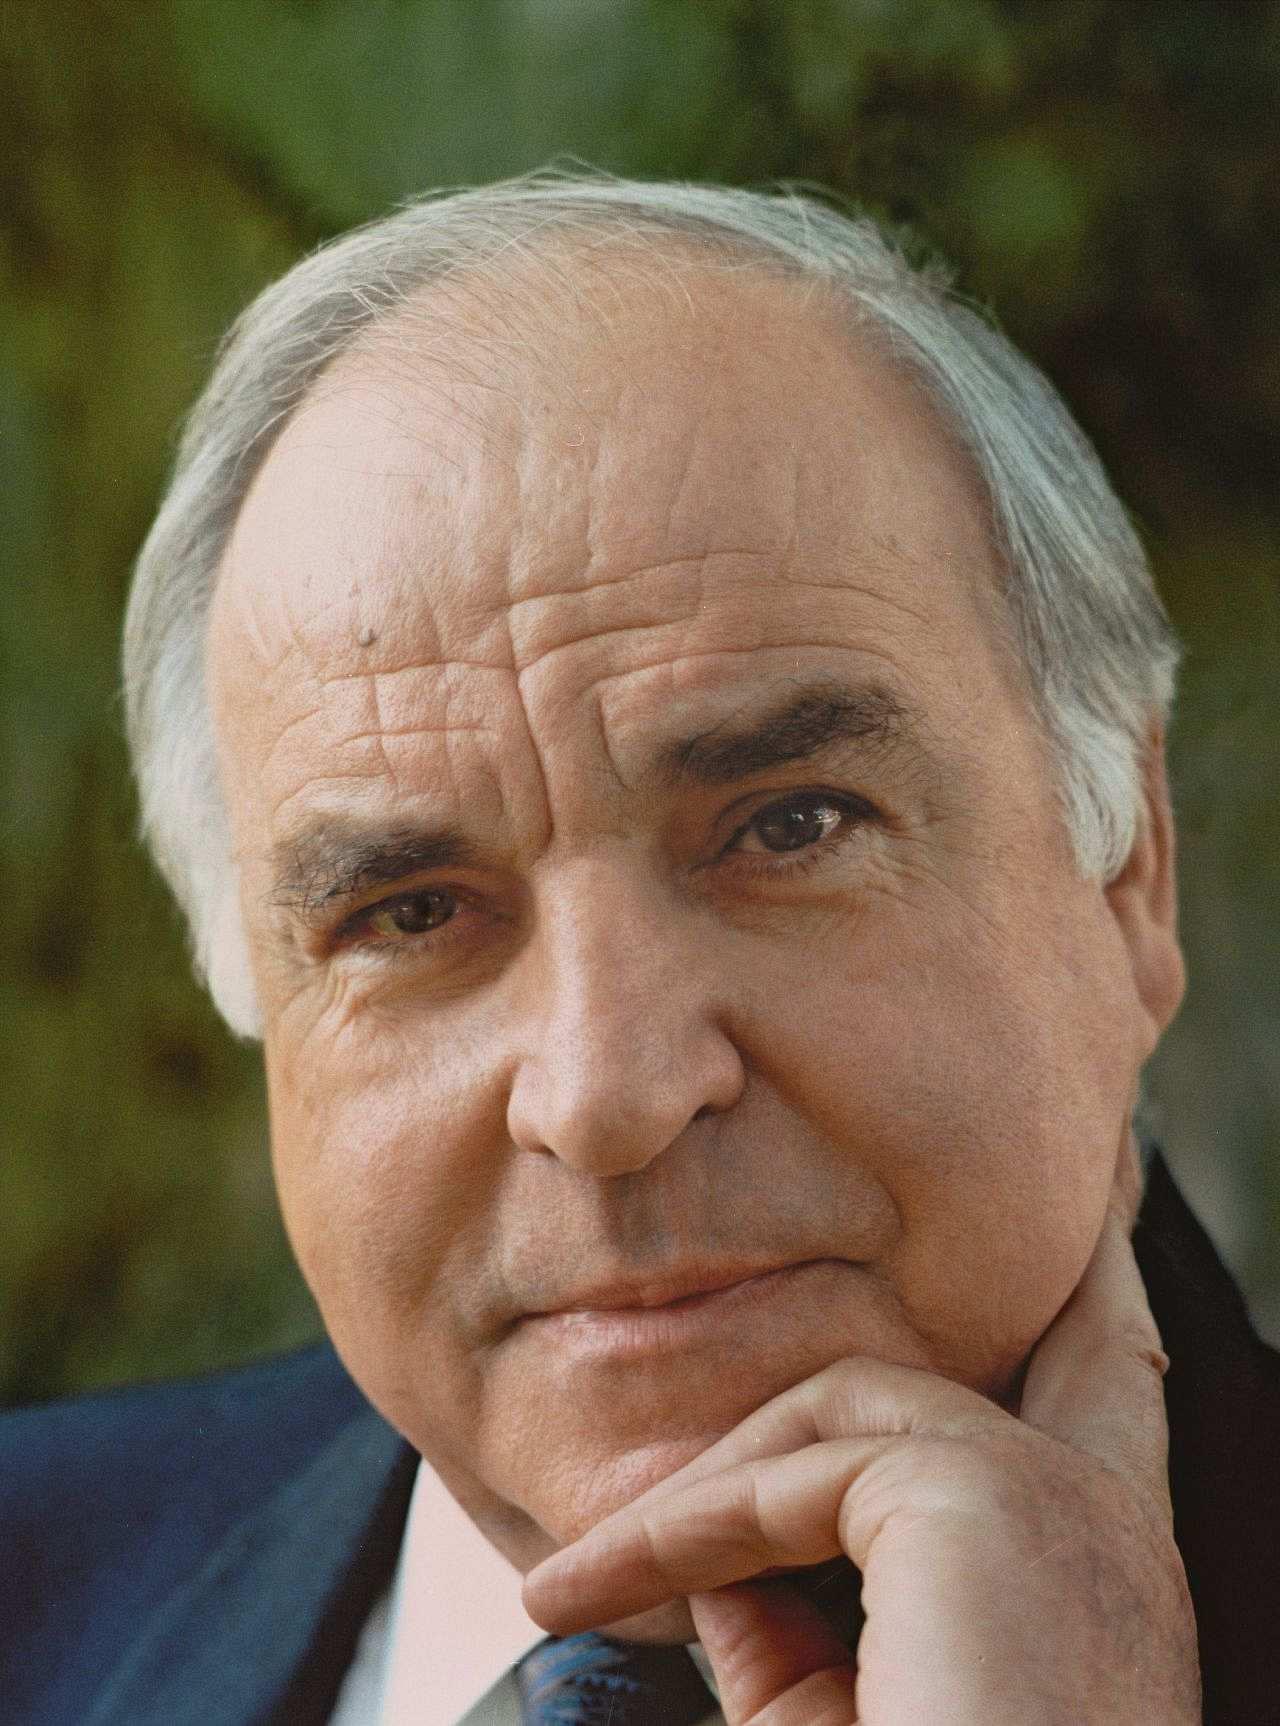 Porträtfoto von Bundeskanzler <b>Helmut Kohl</b>, 1996. - kohl-helmut_foto_LEMO-F-5-009_bbst